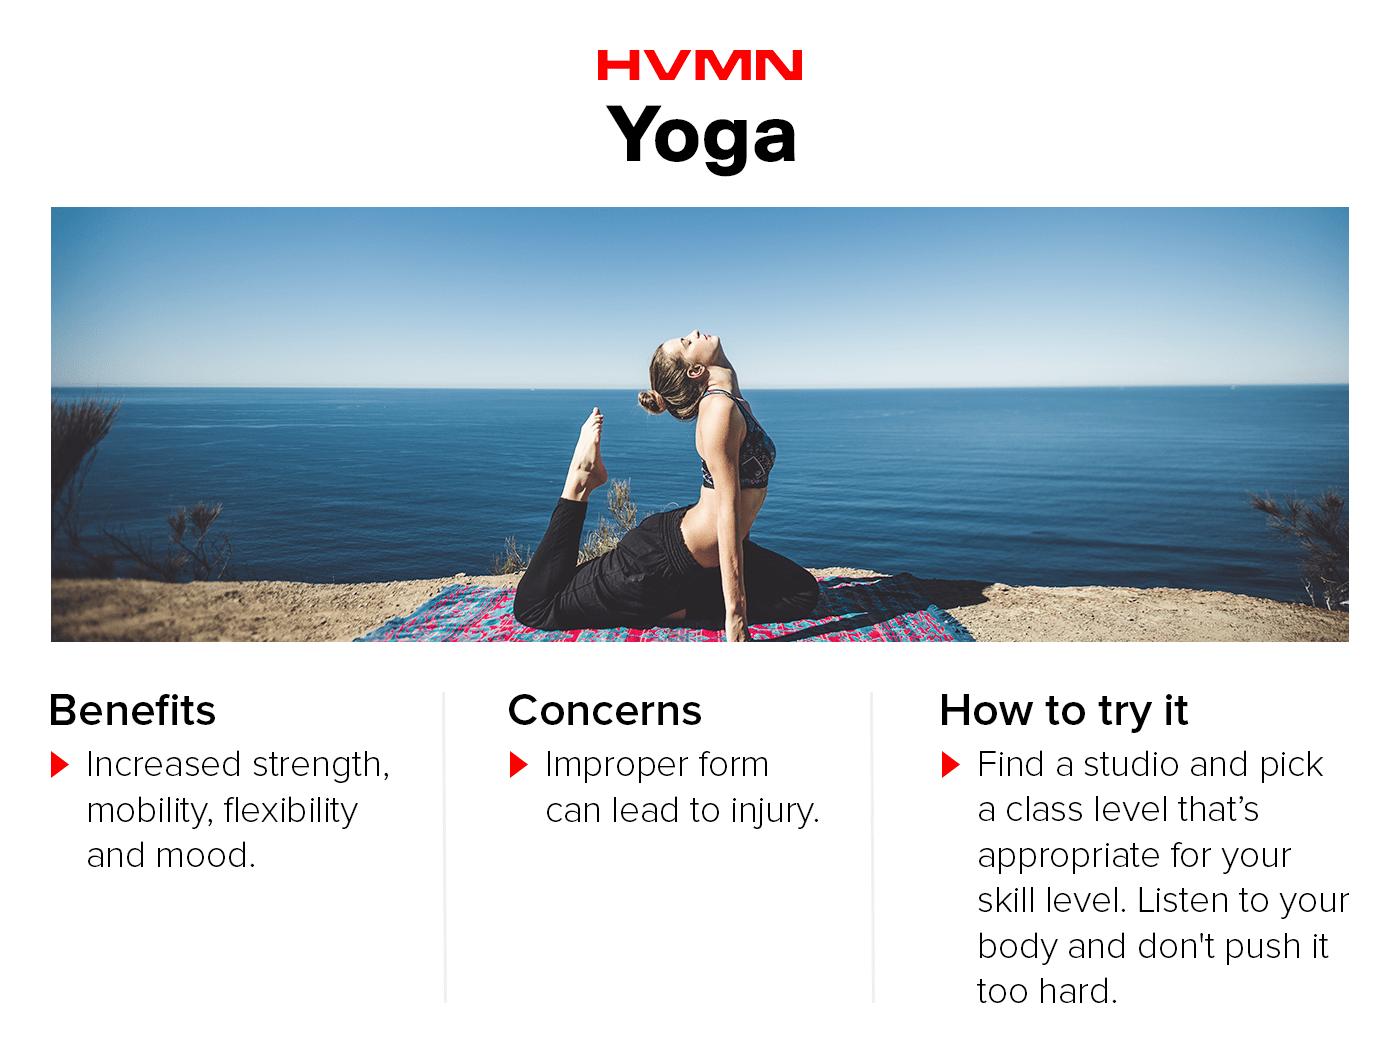 crossfit vacation yoga tour